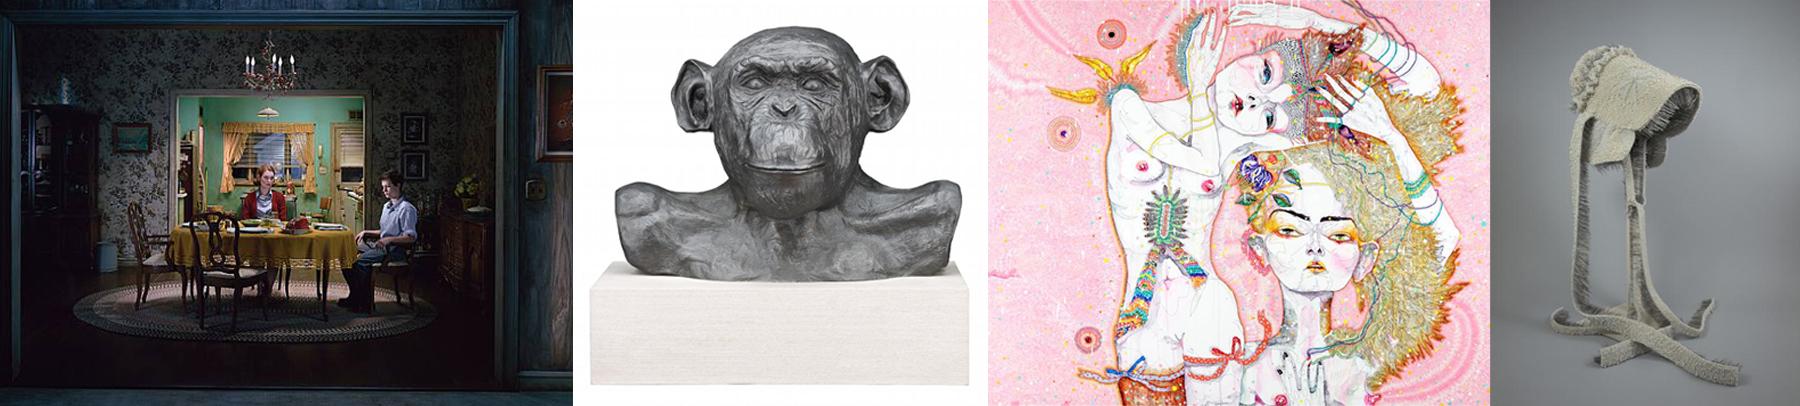 Artist clipart visual art. Hsc resources a resource